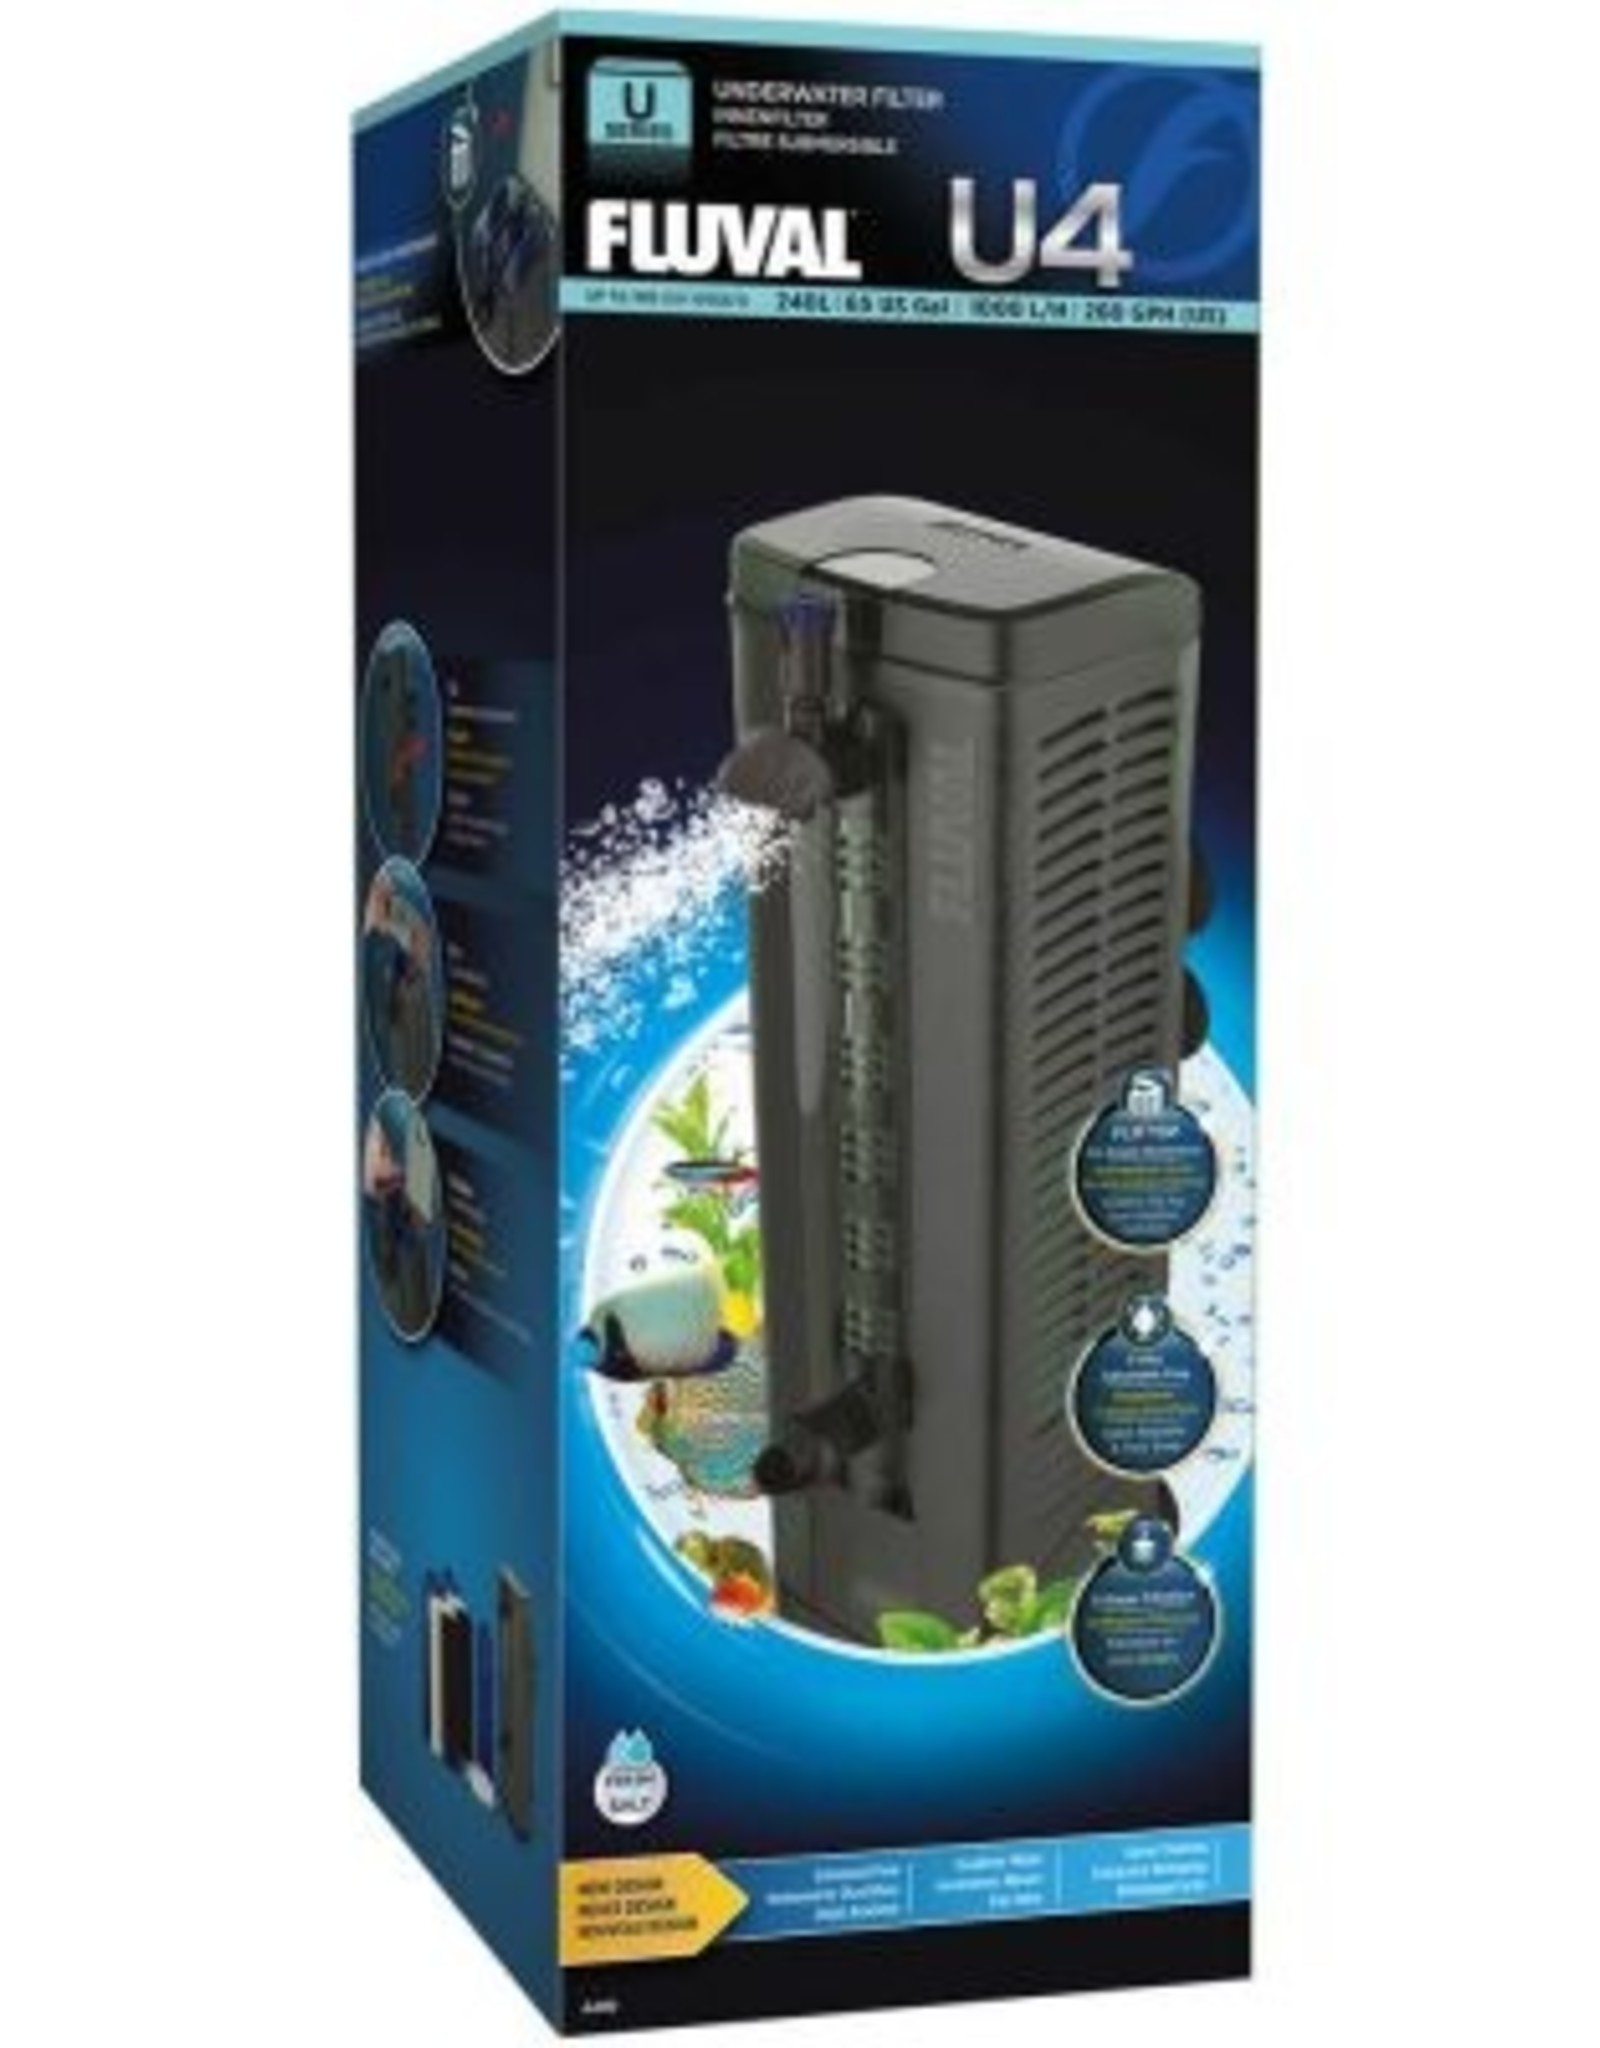 HAGEN FLUVAL U4 UNDERWATER FILTER 6.5 GAL